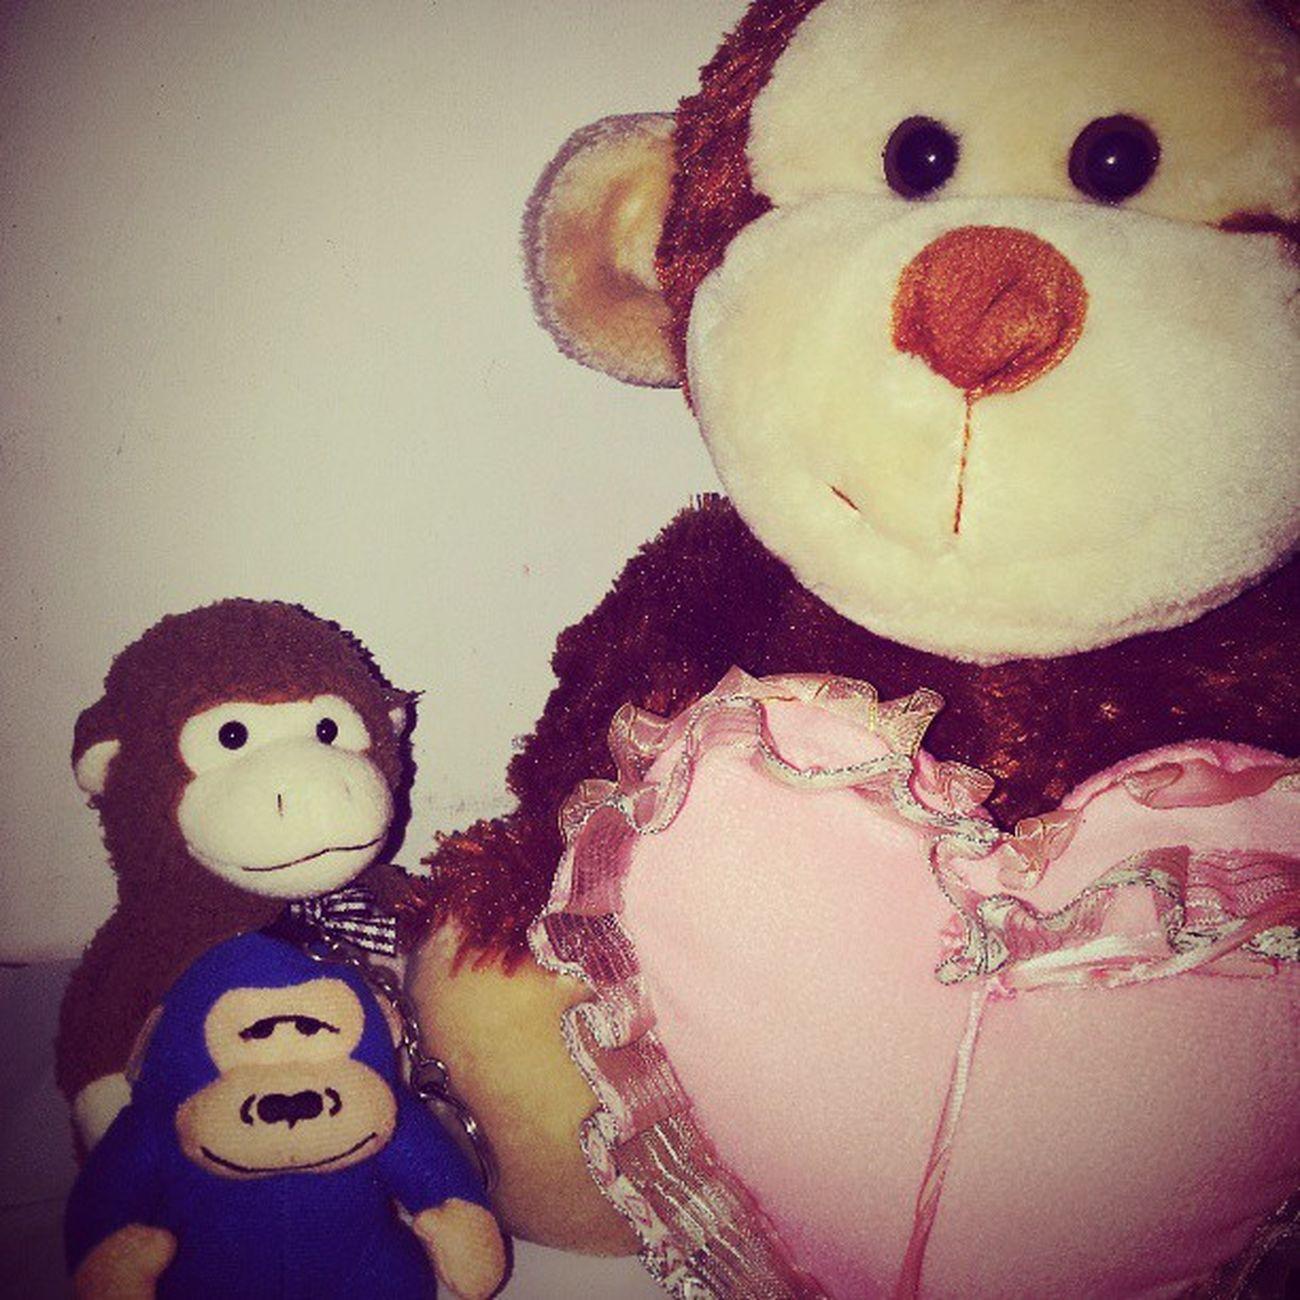 Monkeyfamily FromHer @vaniatannia